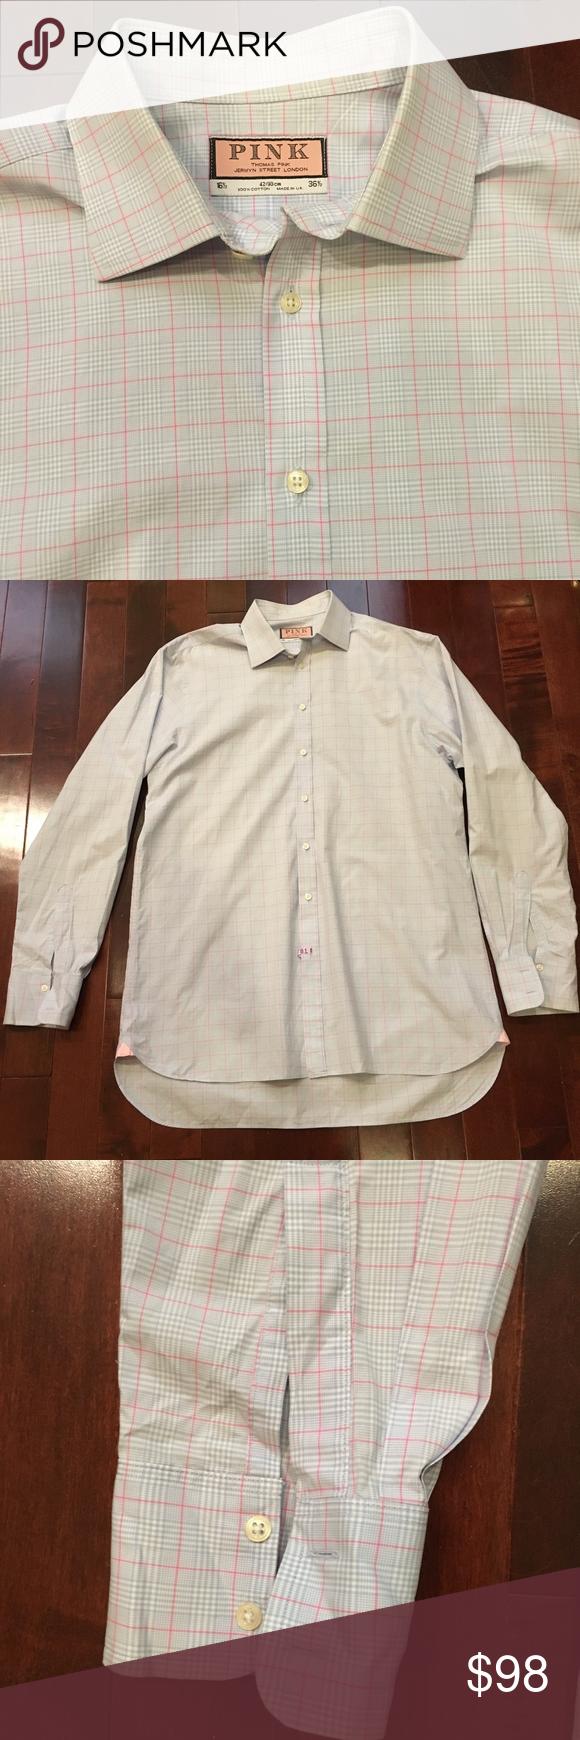 Pink dress shirt blue suit  Menus Thomas Pink Plaid Dress Shirt Great condition Freshly